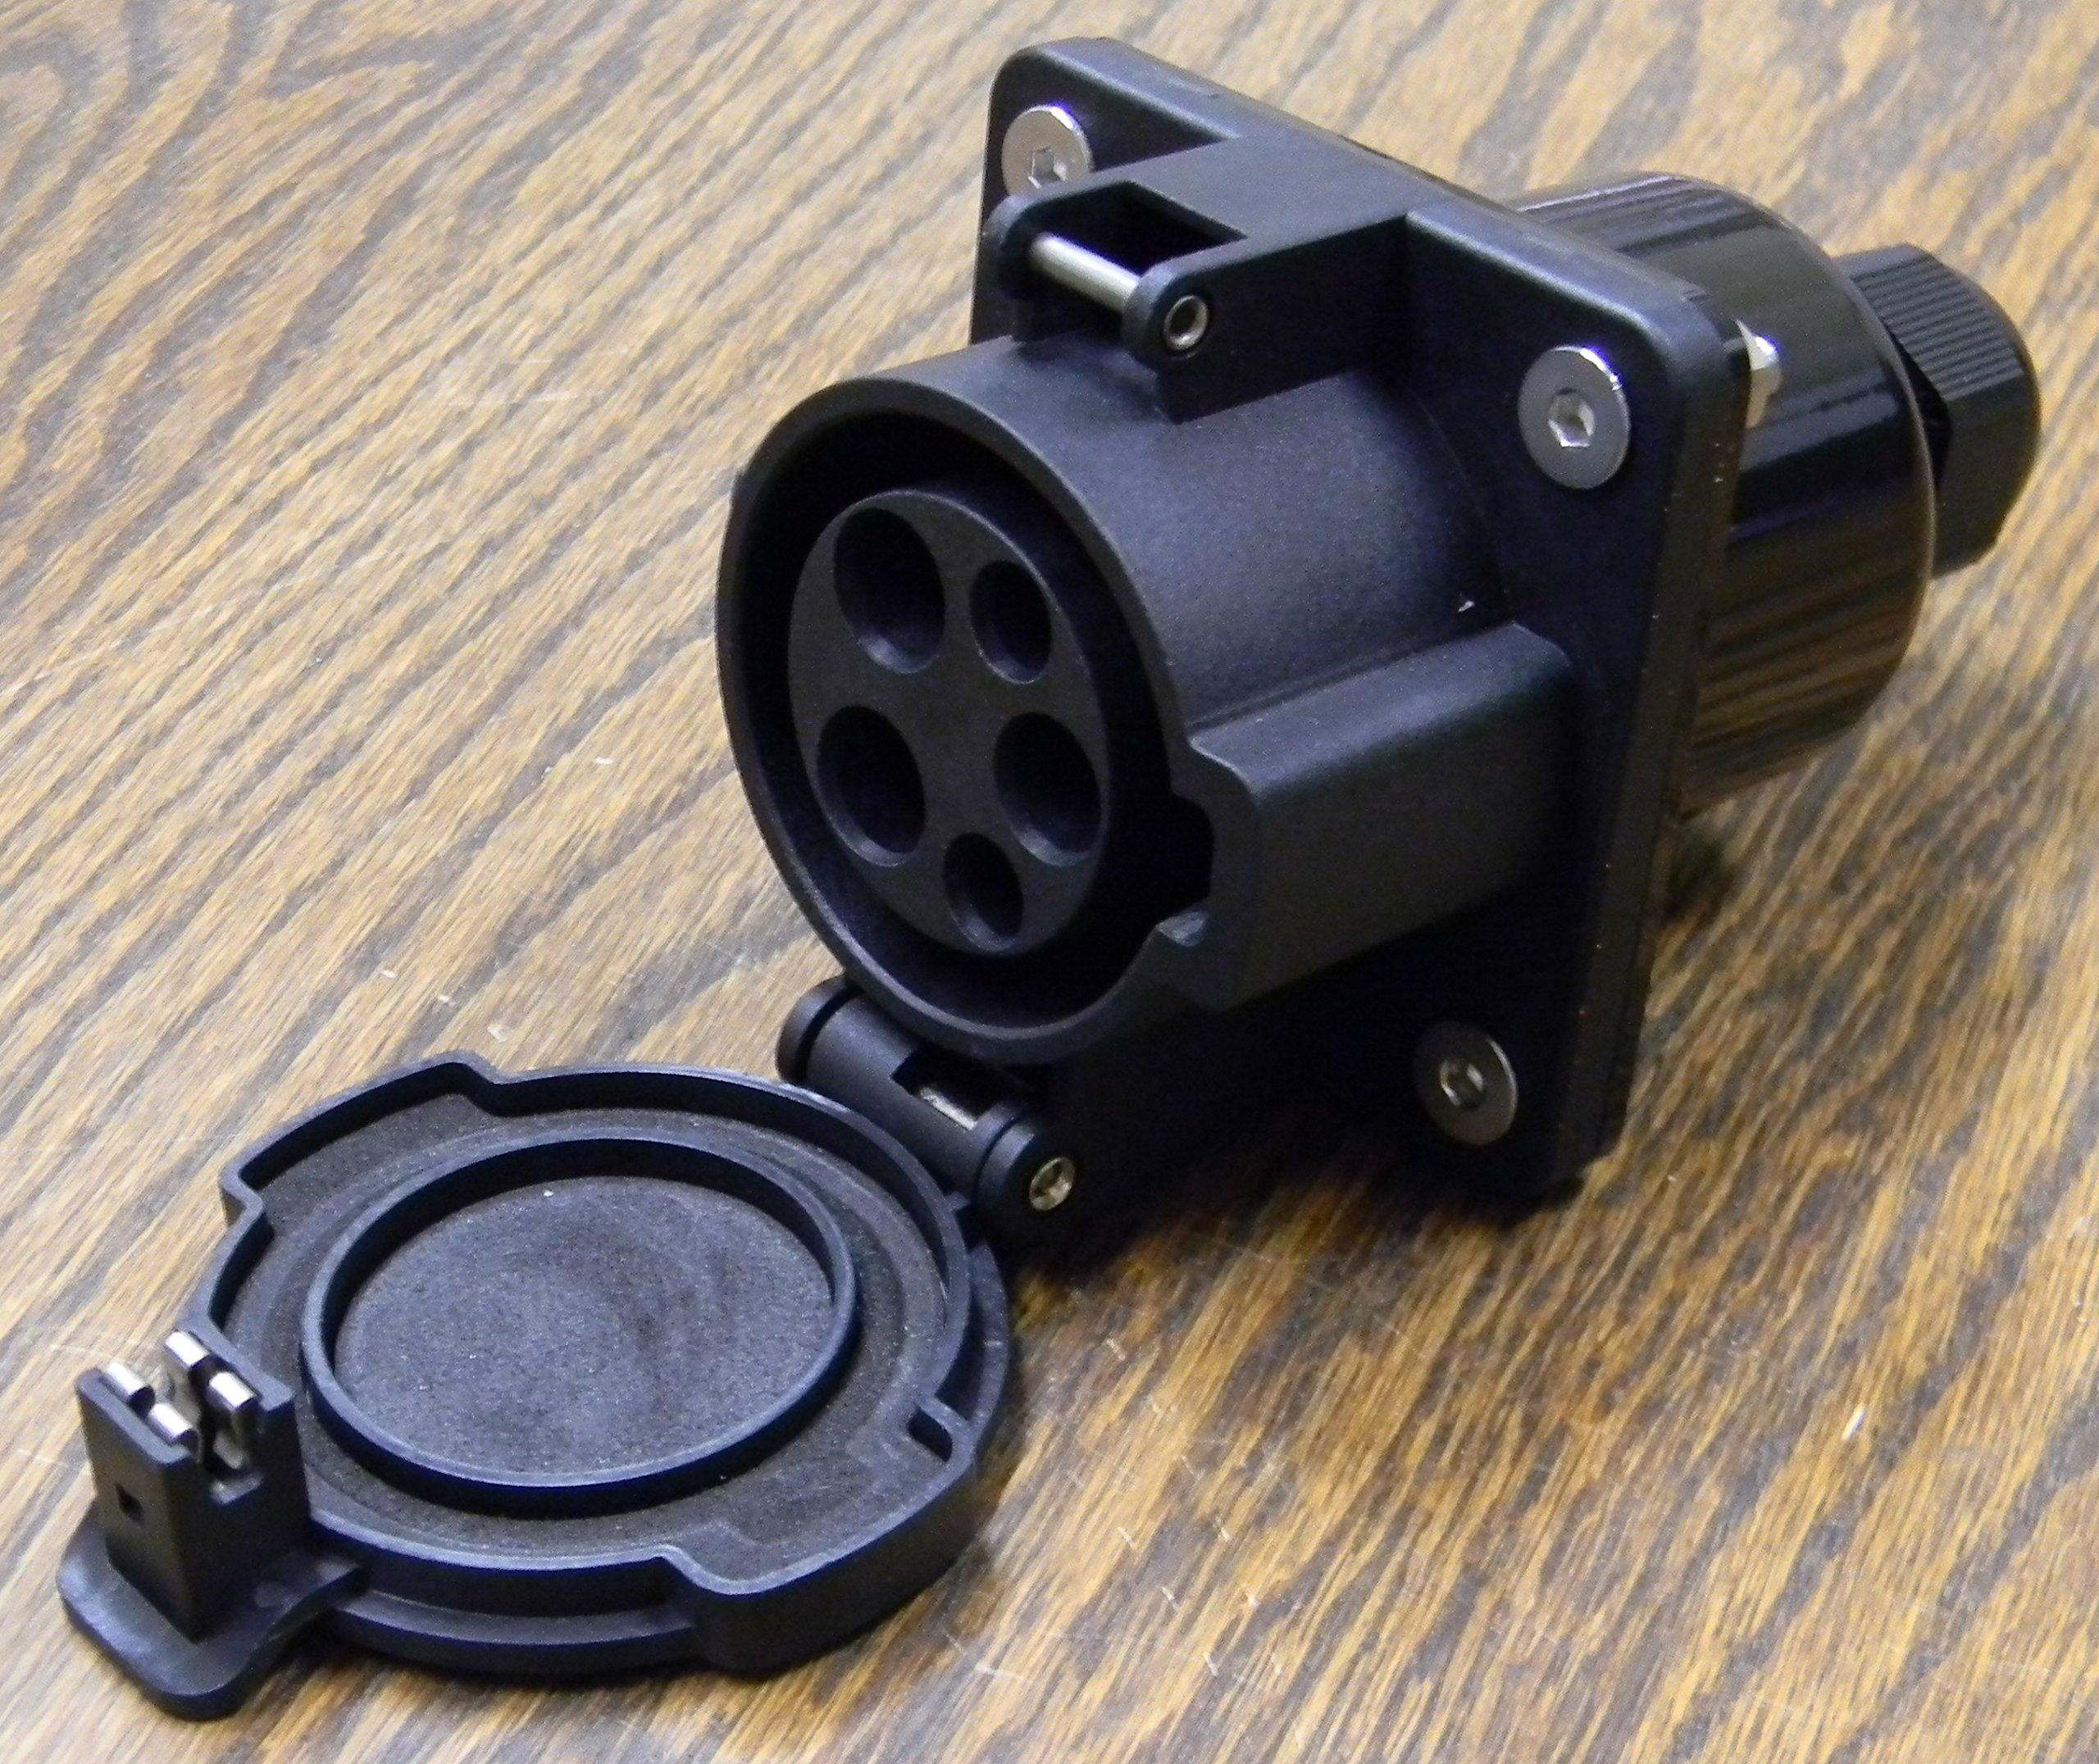 J1772 Socket-Inlet Level 2 50/70A 120/240V - USA Stock! - New!